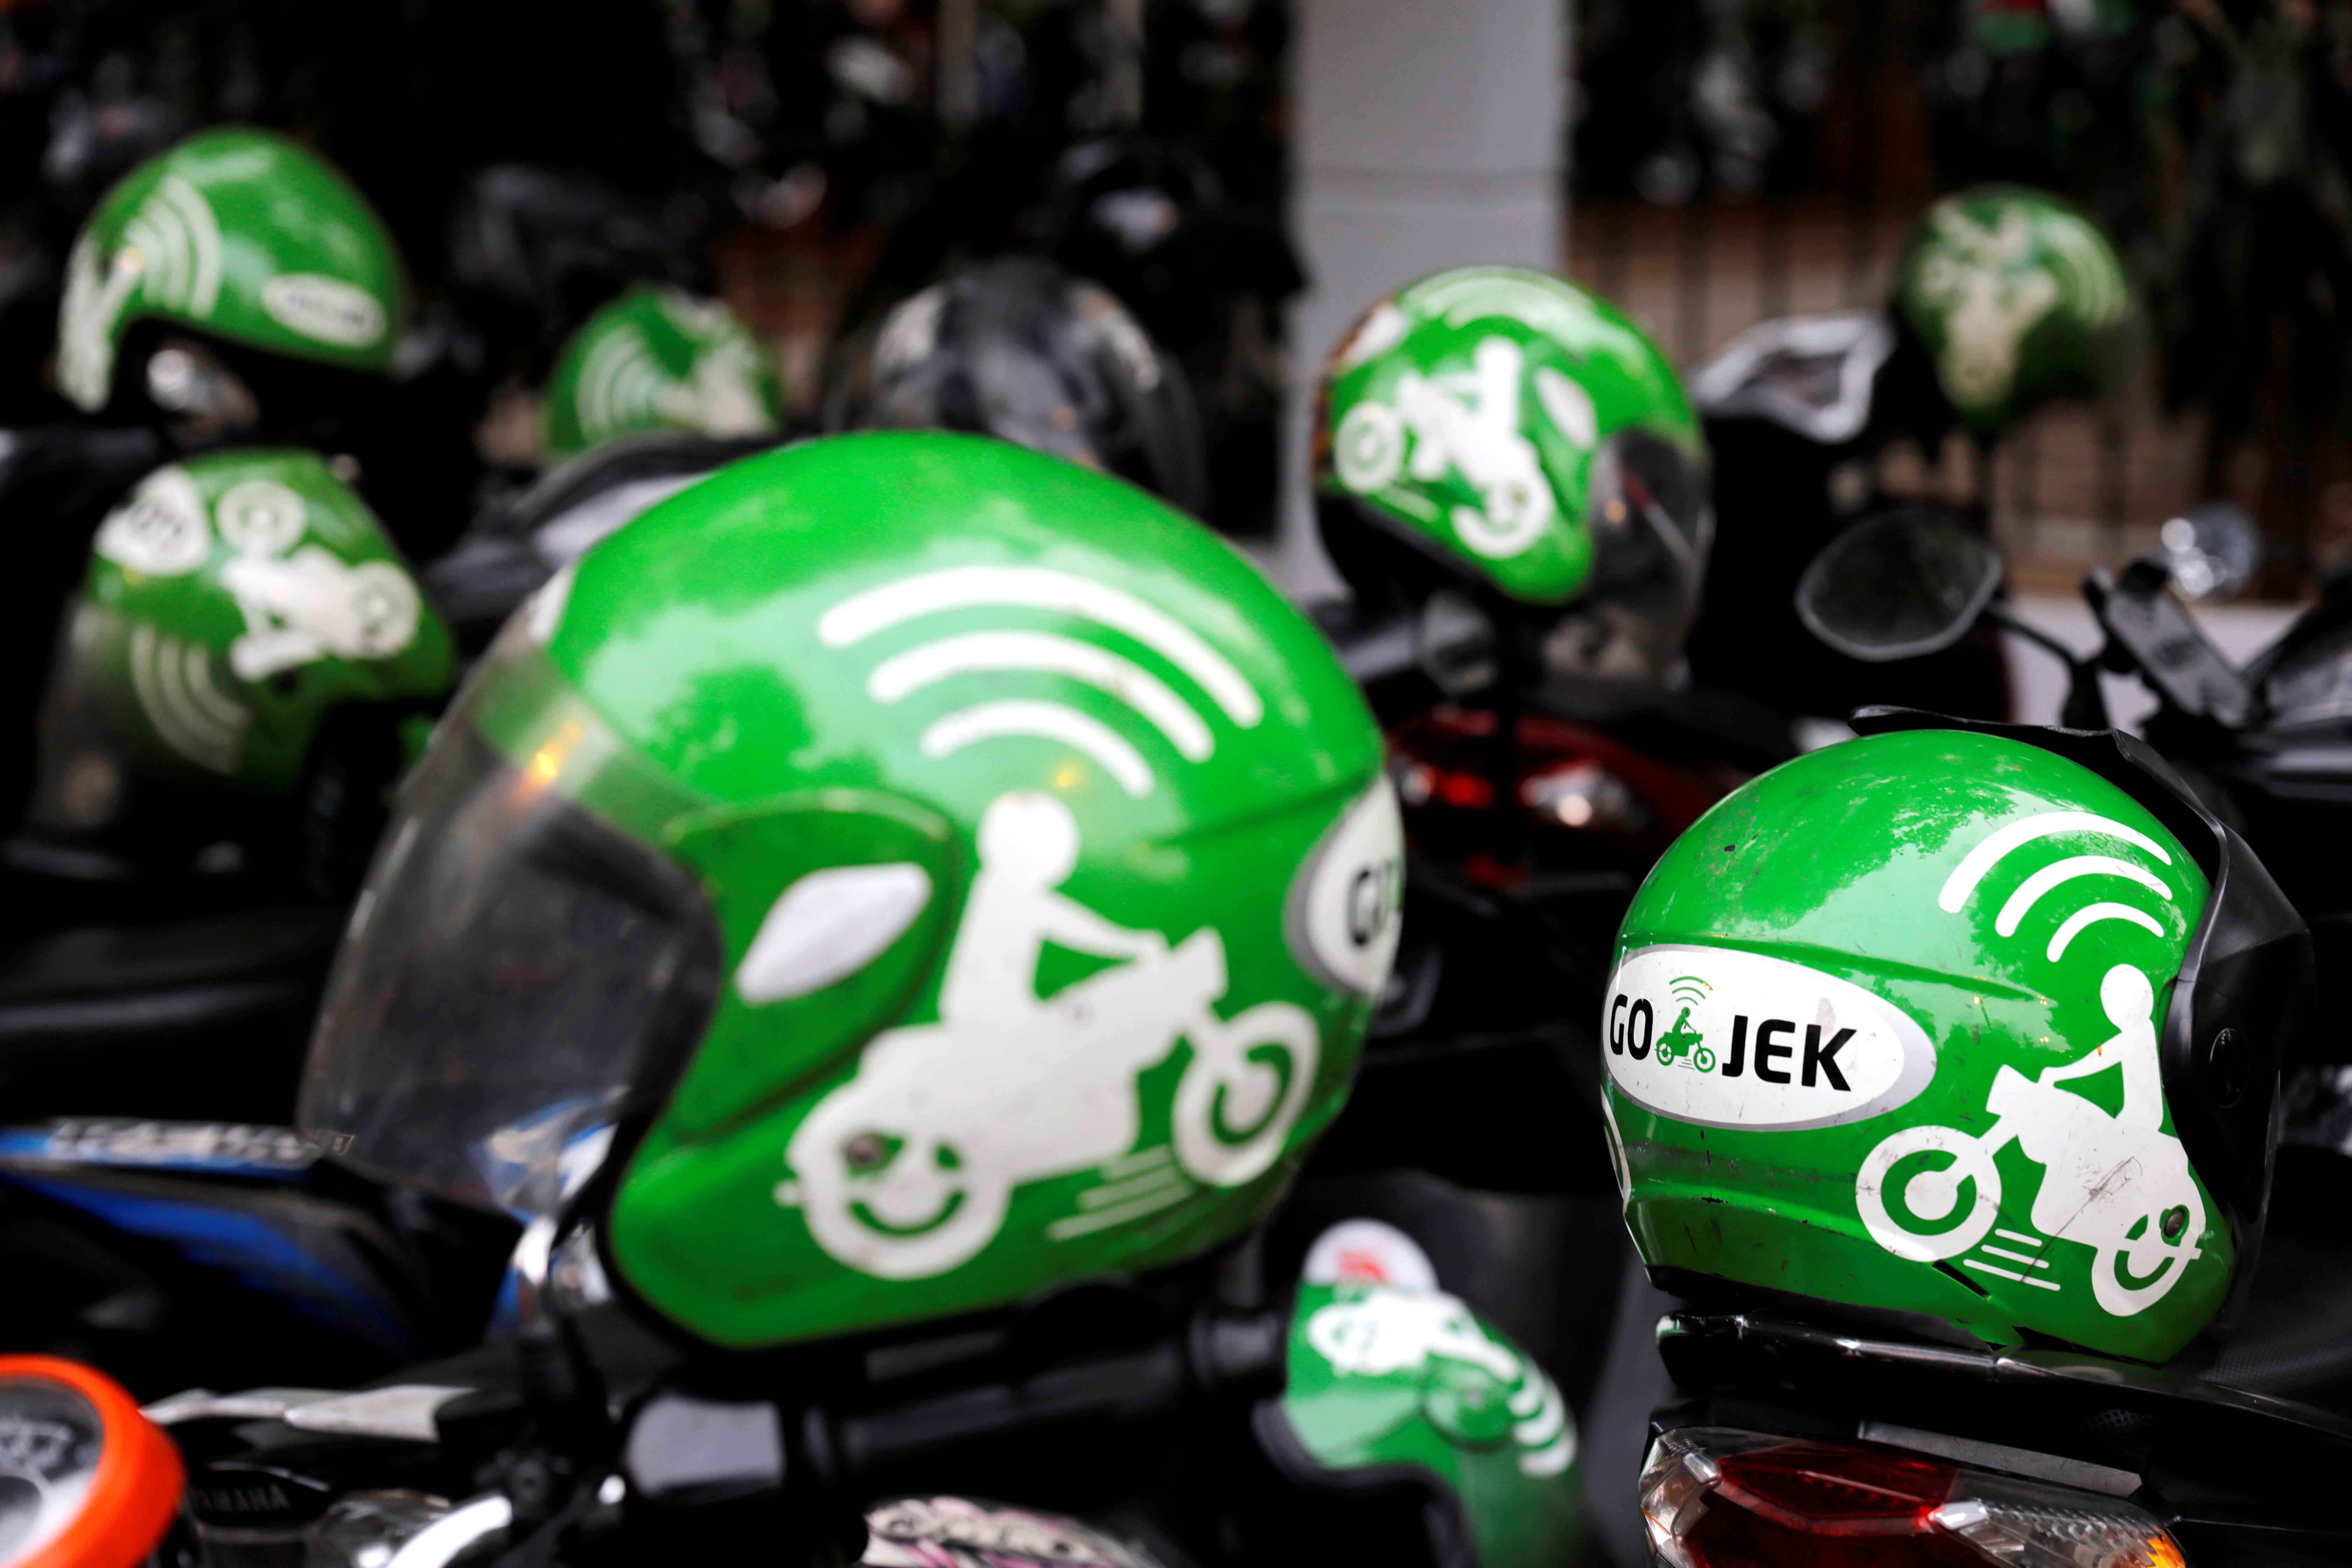 Focus: Grab, Go-Jek wage street fight for SE Asia 'super-app' supremacy